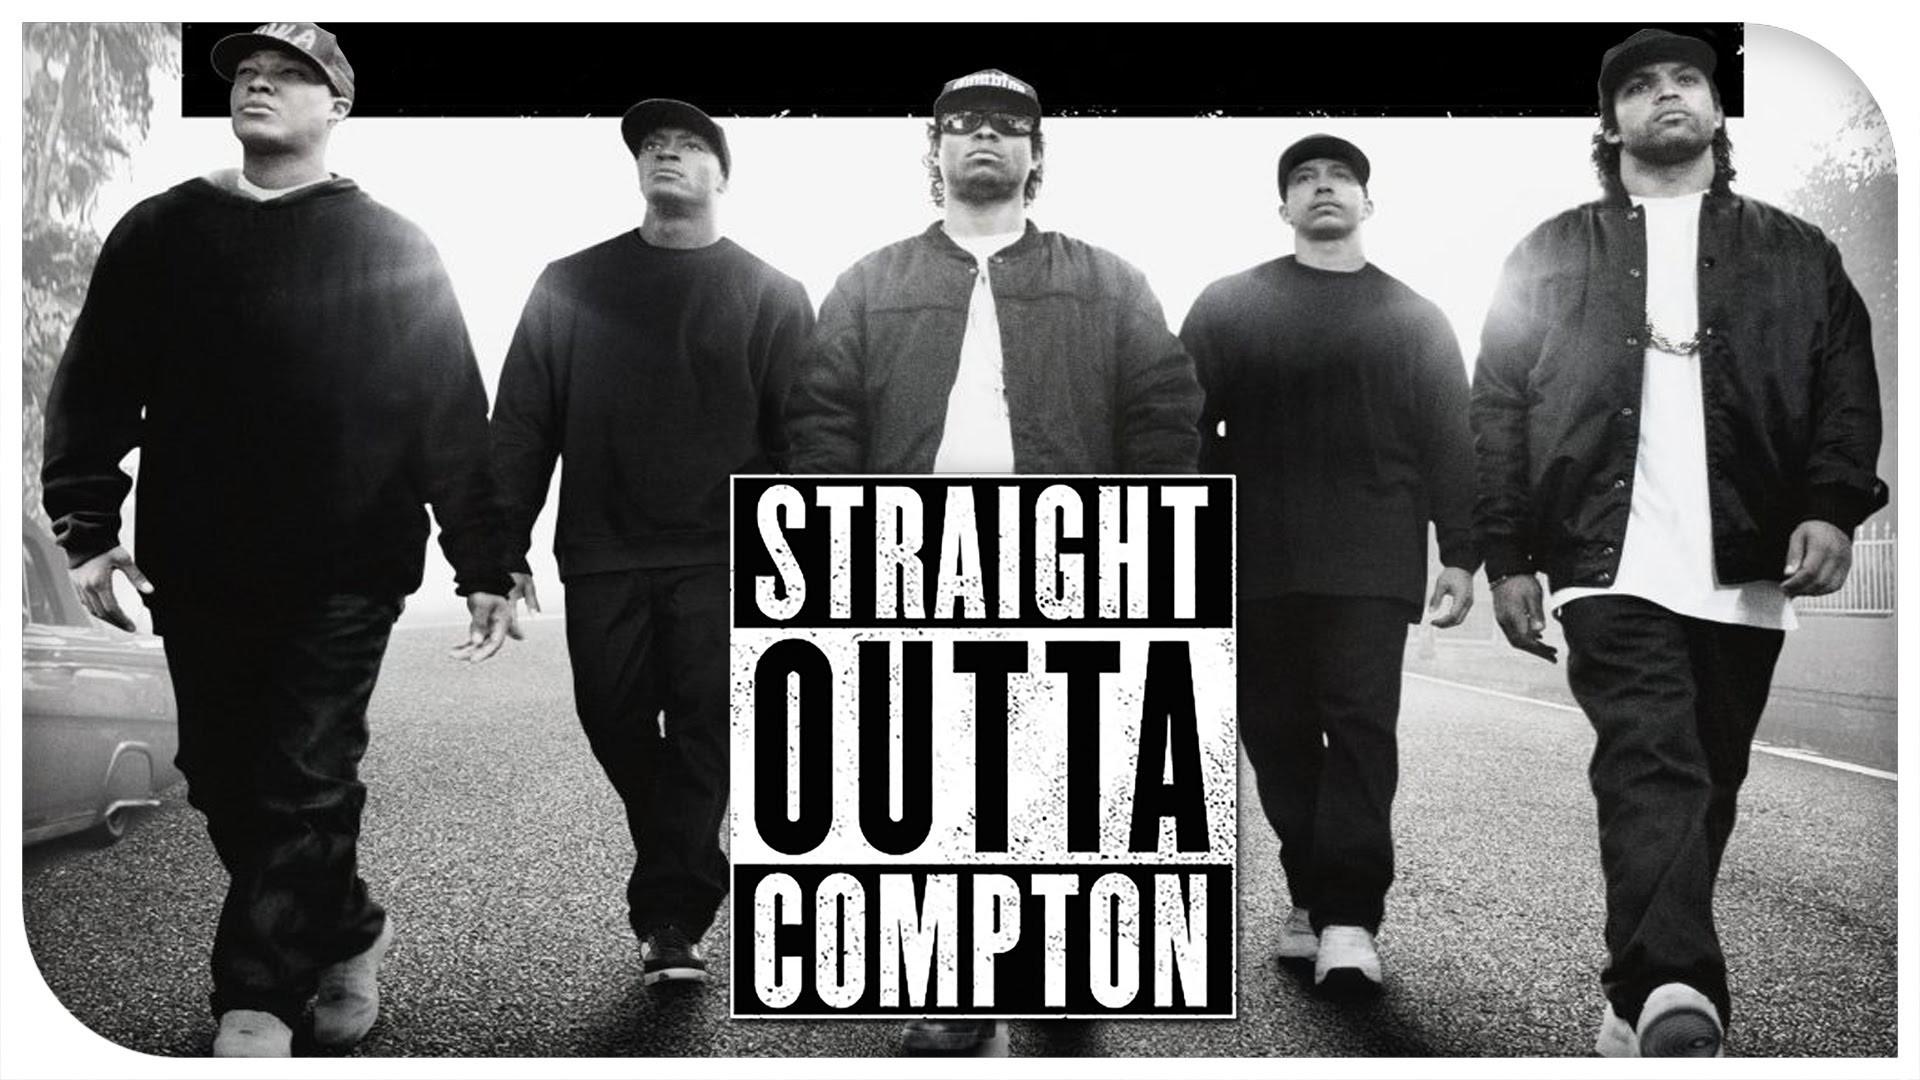 Straight Outta Compton Stream German Kinox.To